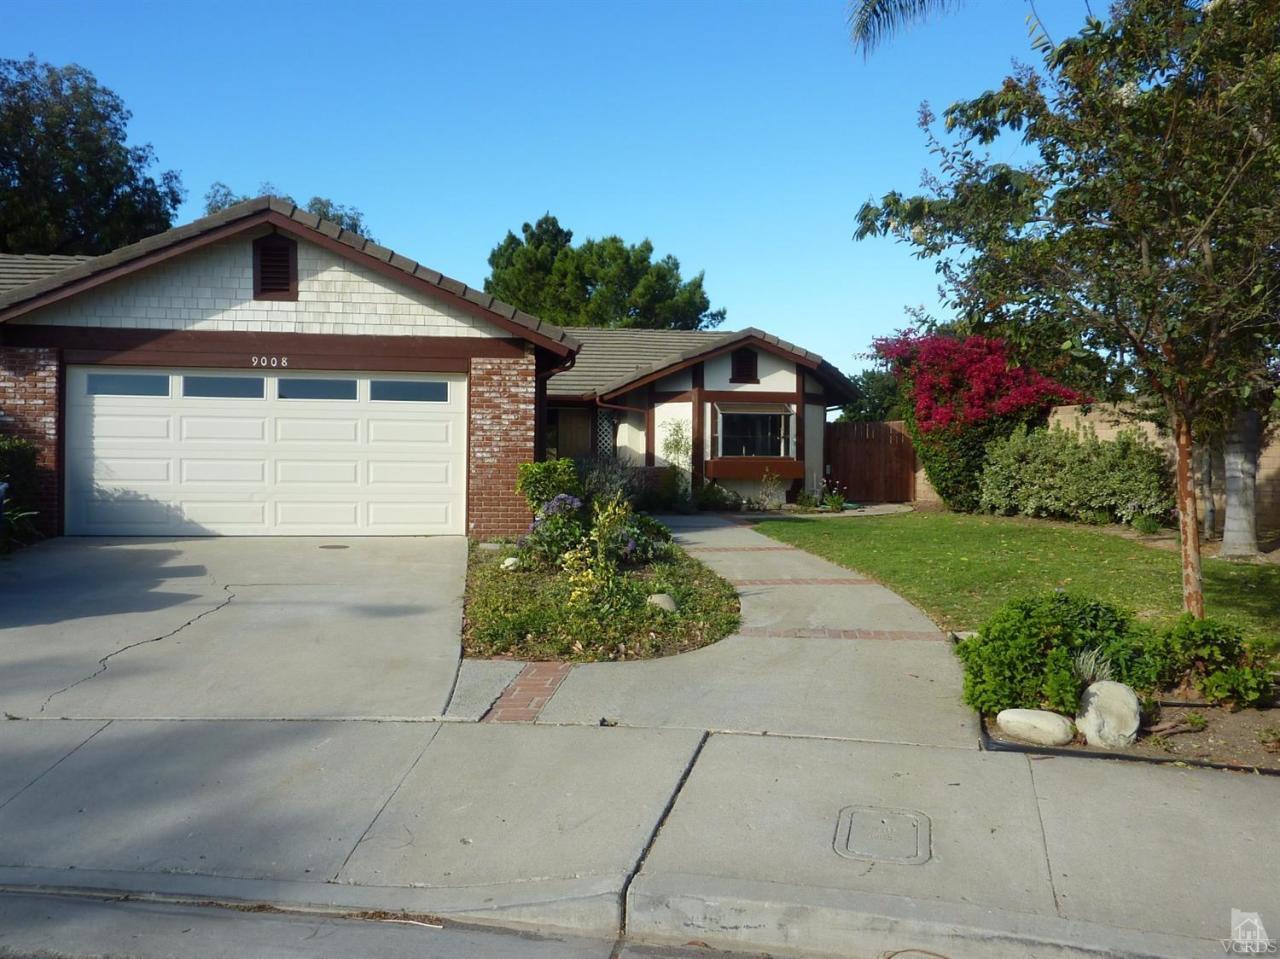 9008 Feather Street, Ventura, CA 93004